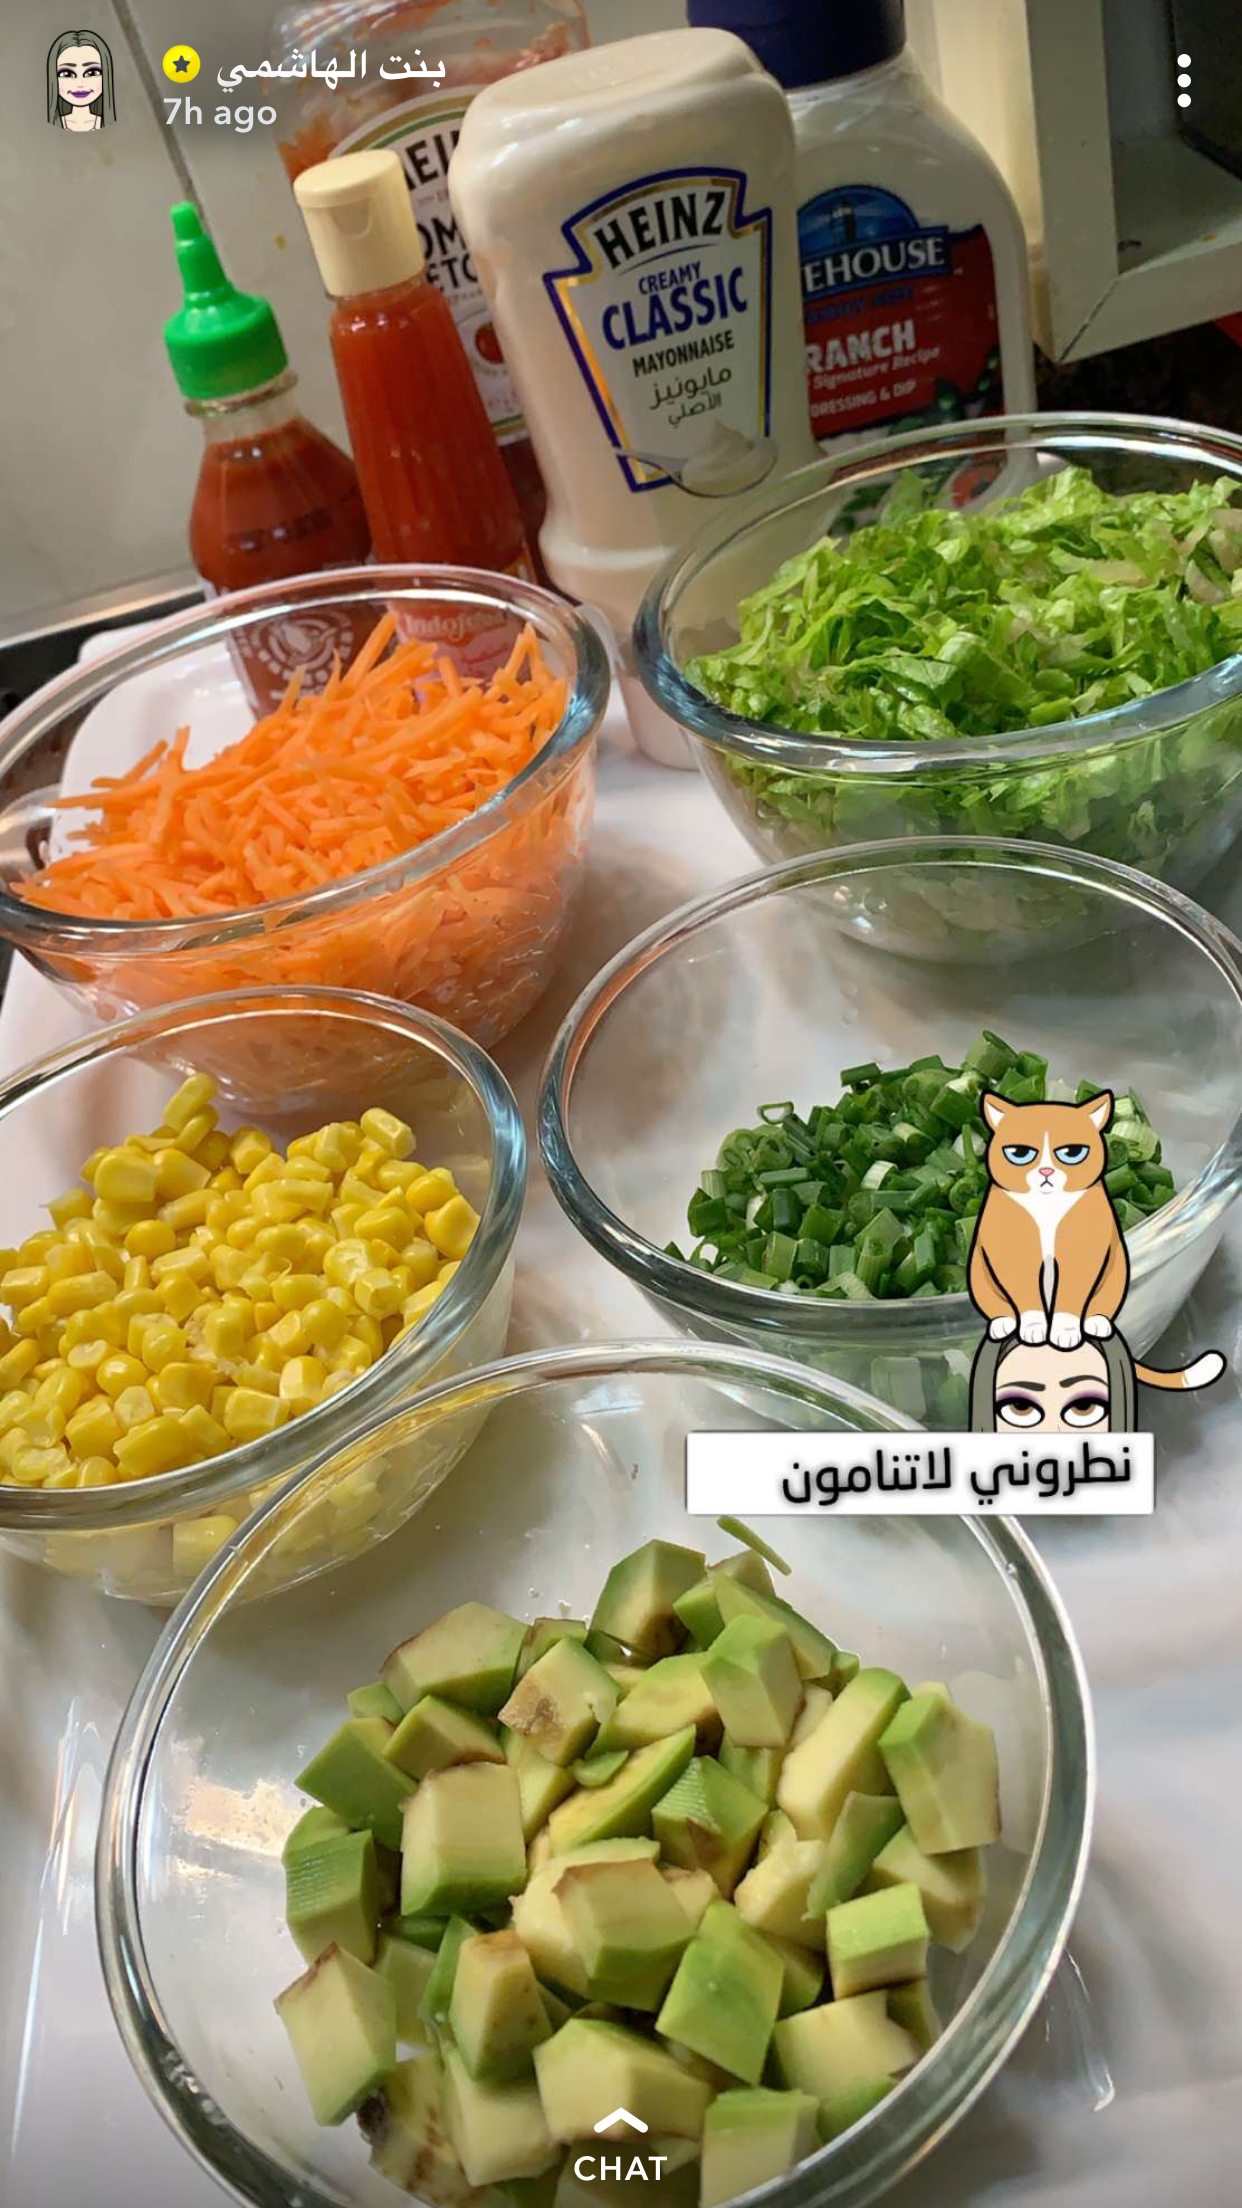 Pin by Maryam Alali on سلطات Arabic food, Food, Salads